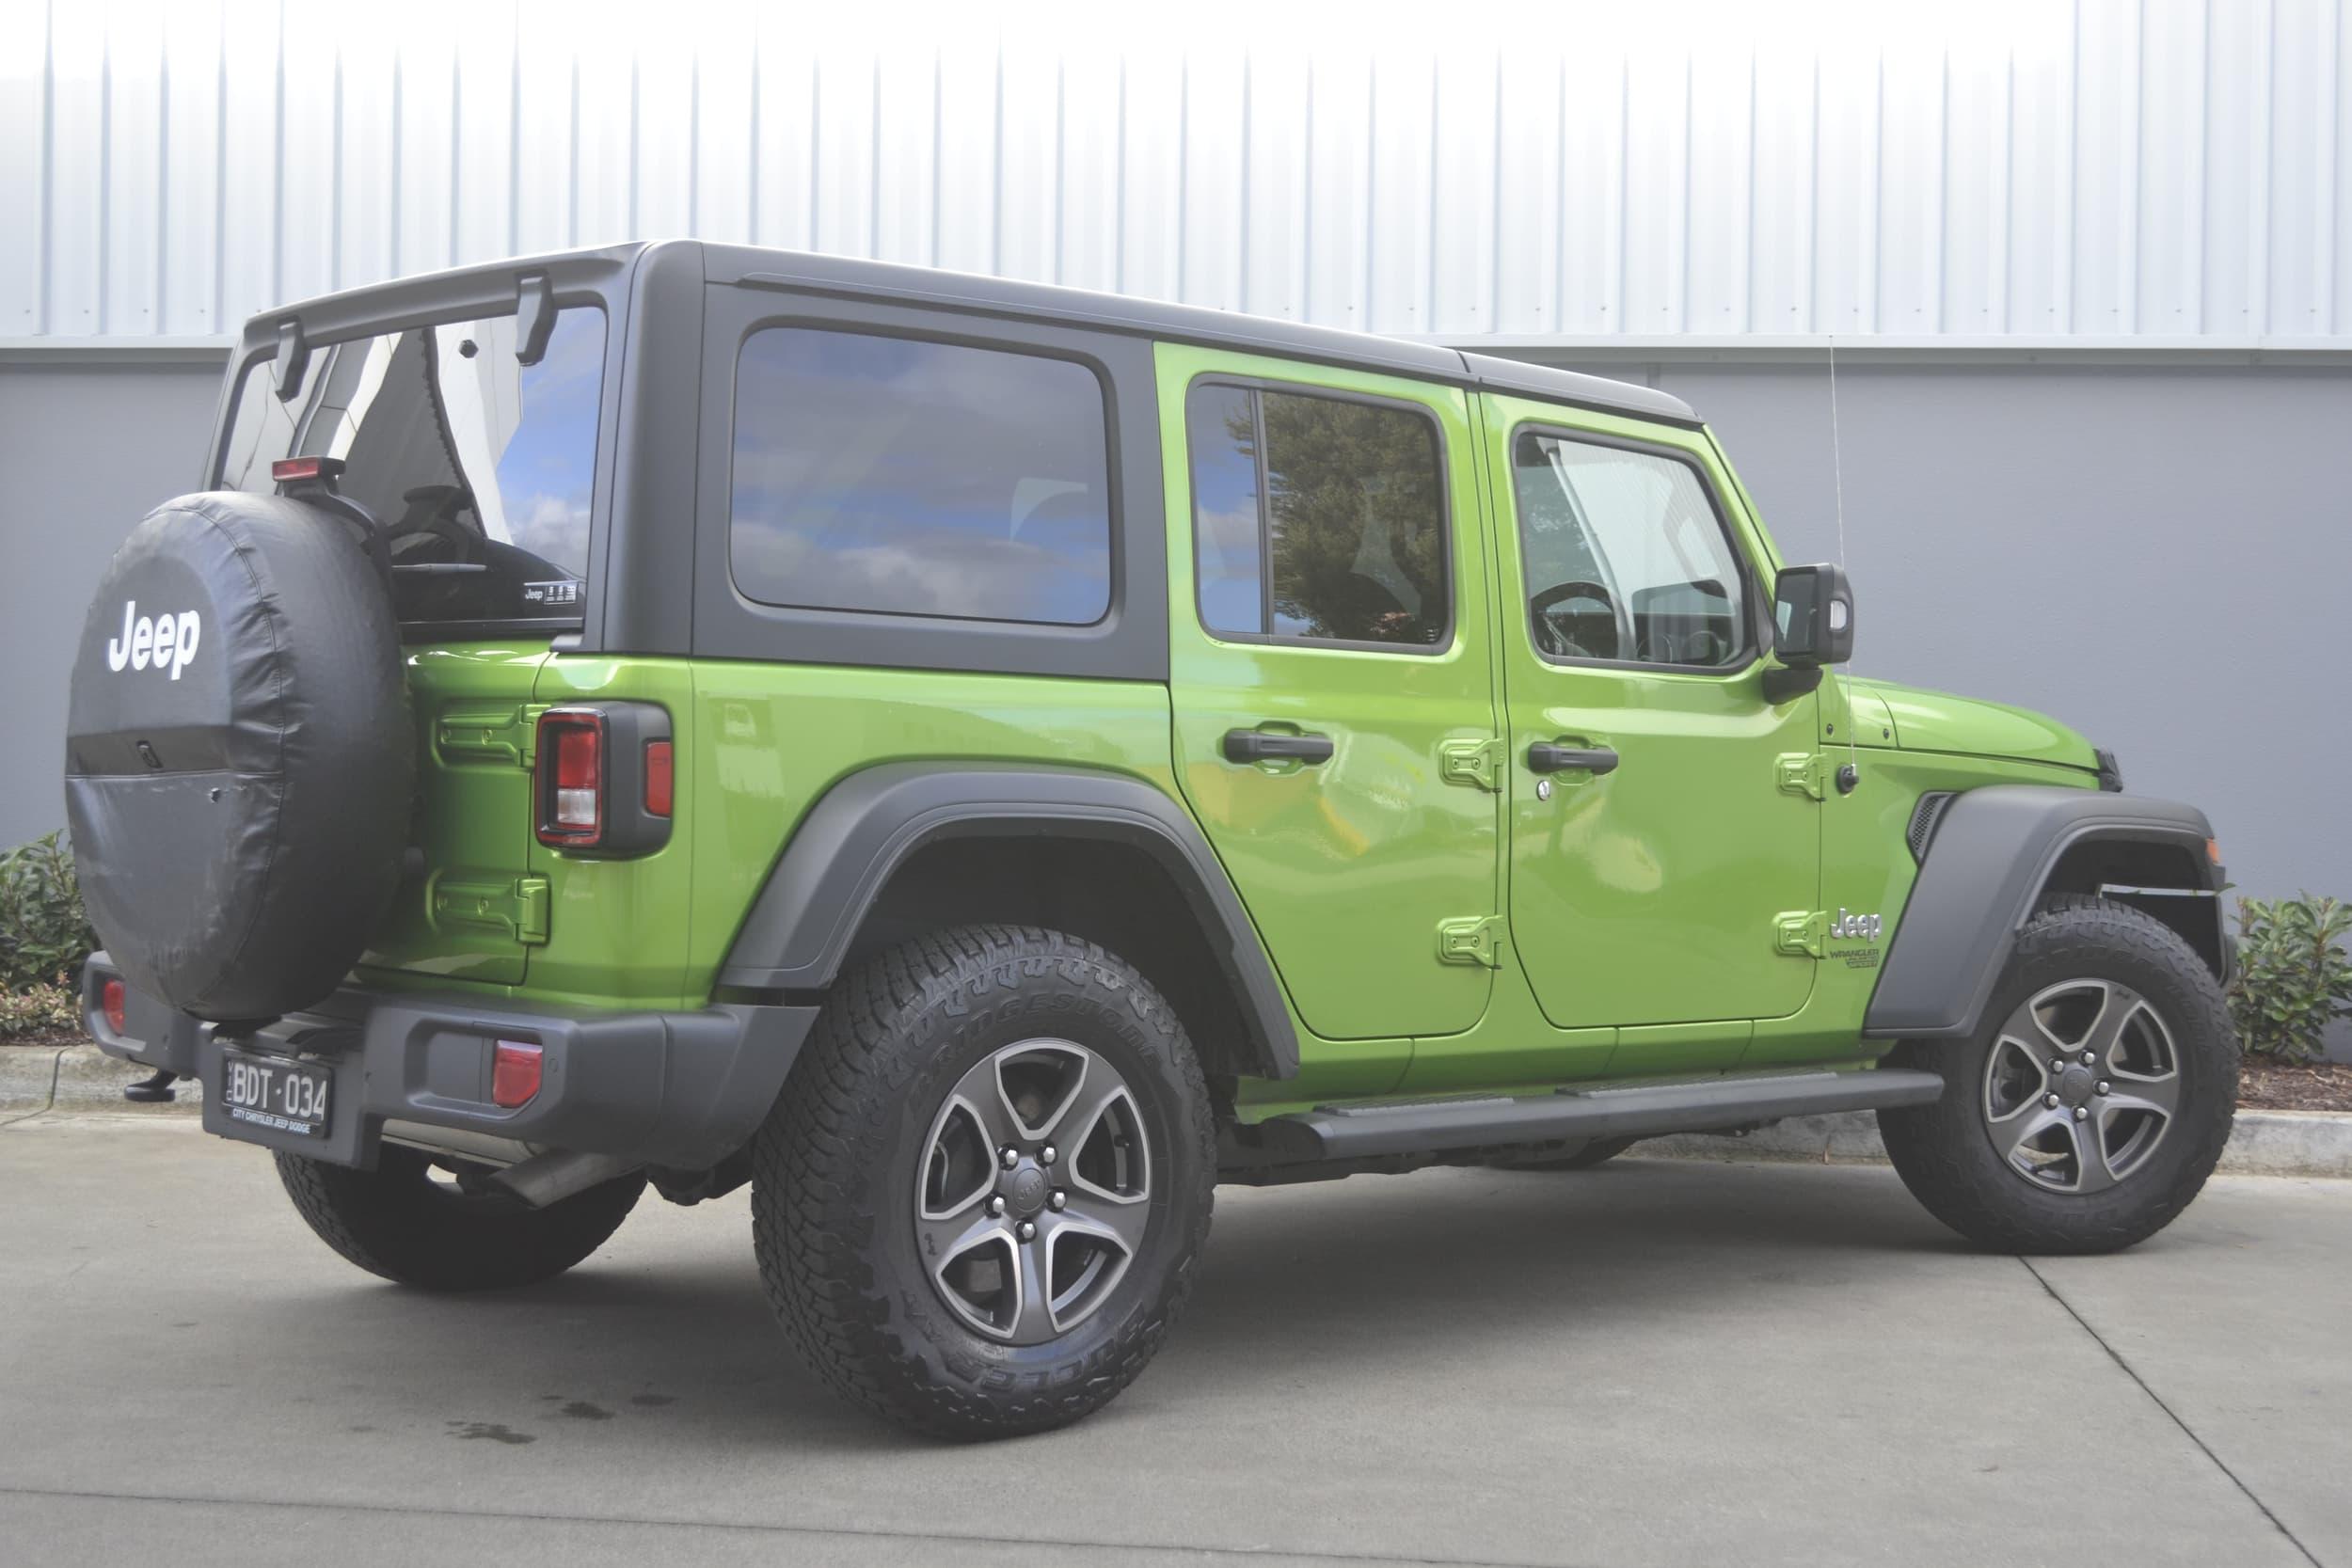 2019 Jeep Wrangler Unlimited Sport S Auto 4x4 MY19 - image 19